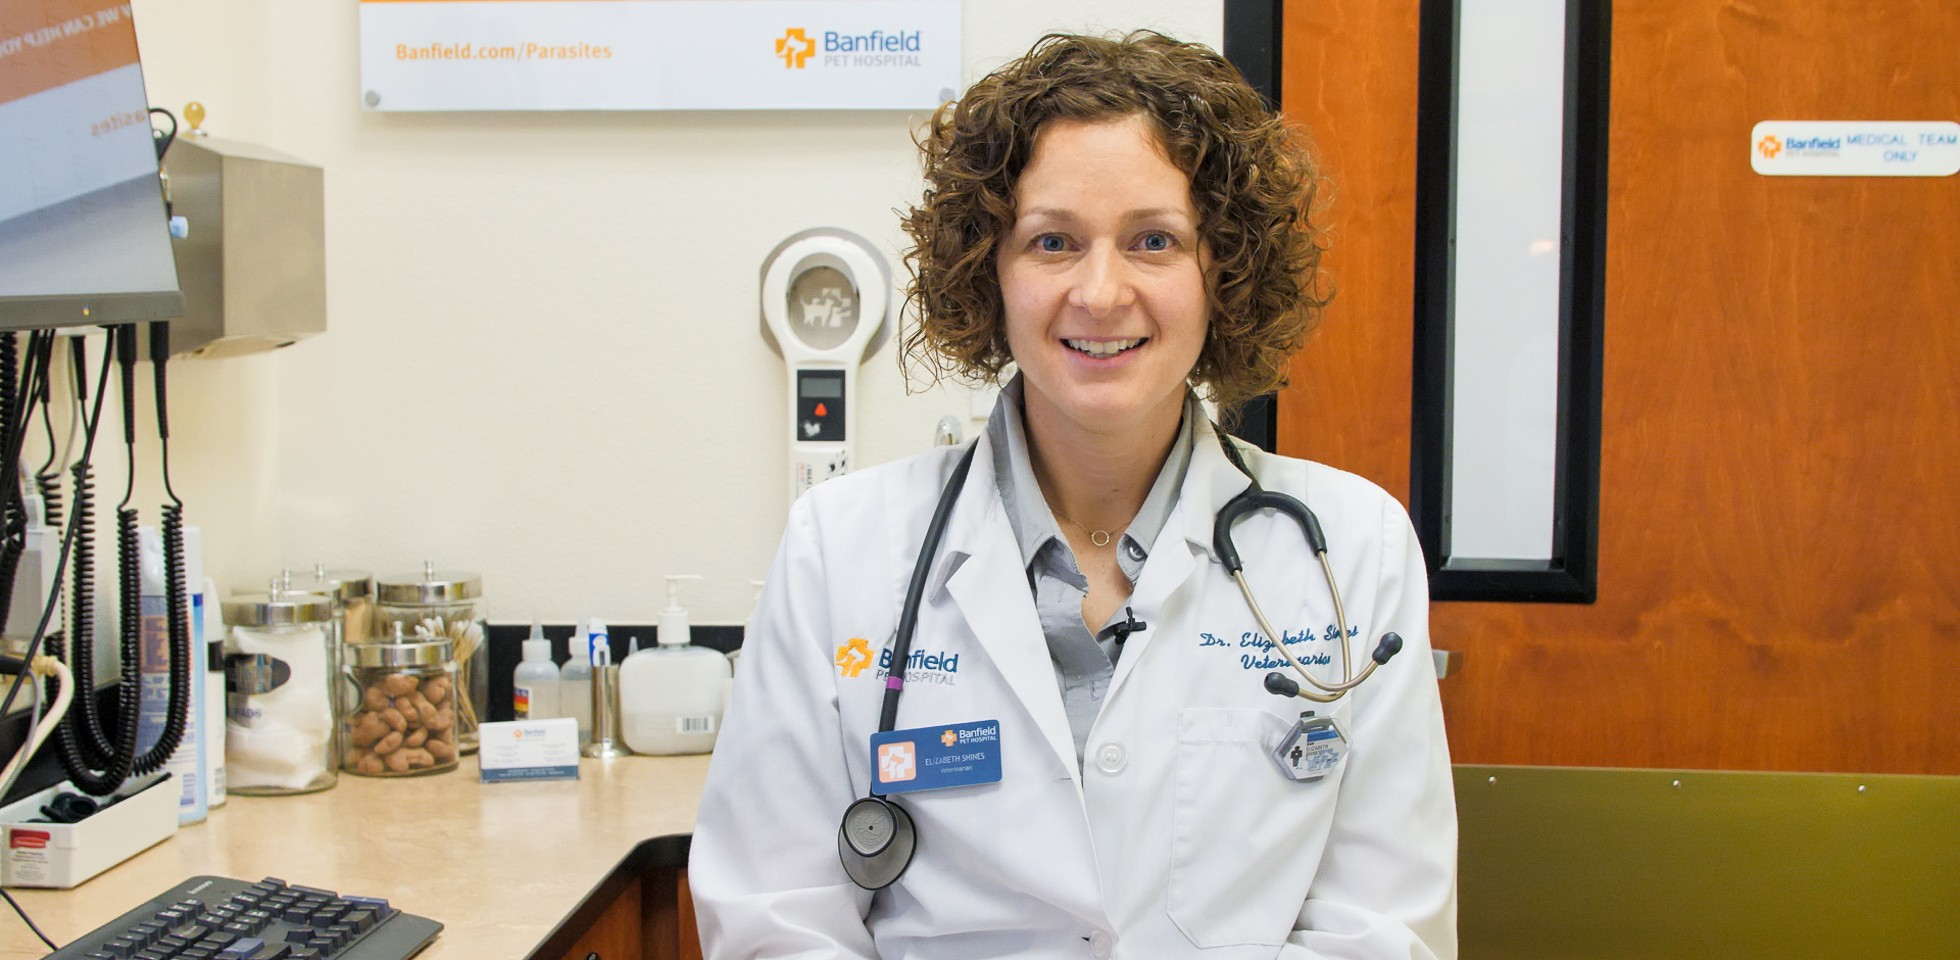 Elizabeth Shines, Veterinarian - Banfield Pet Hospital Careers